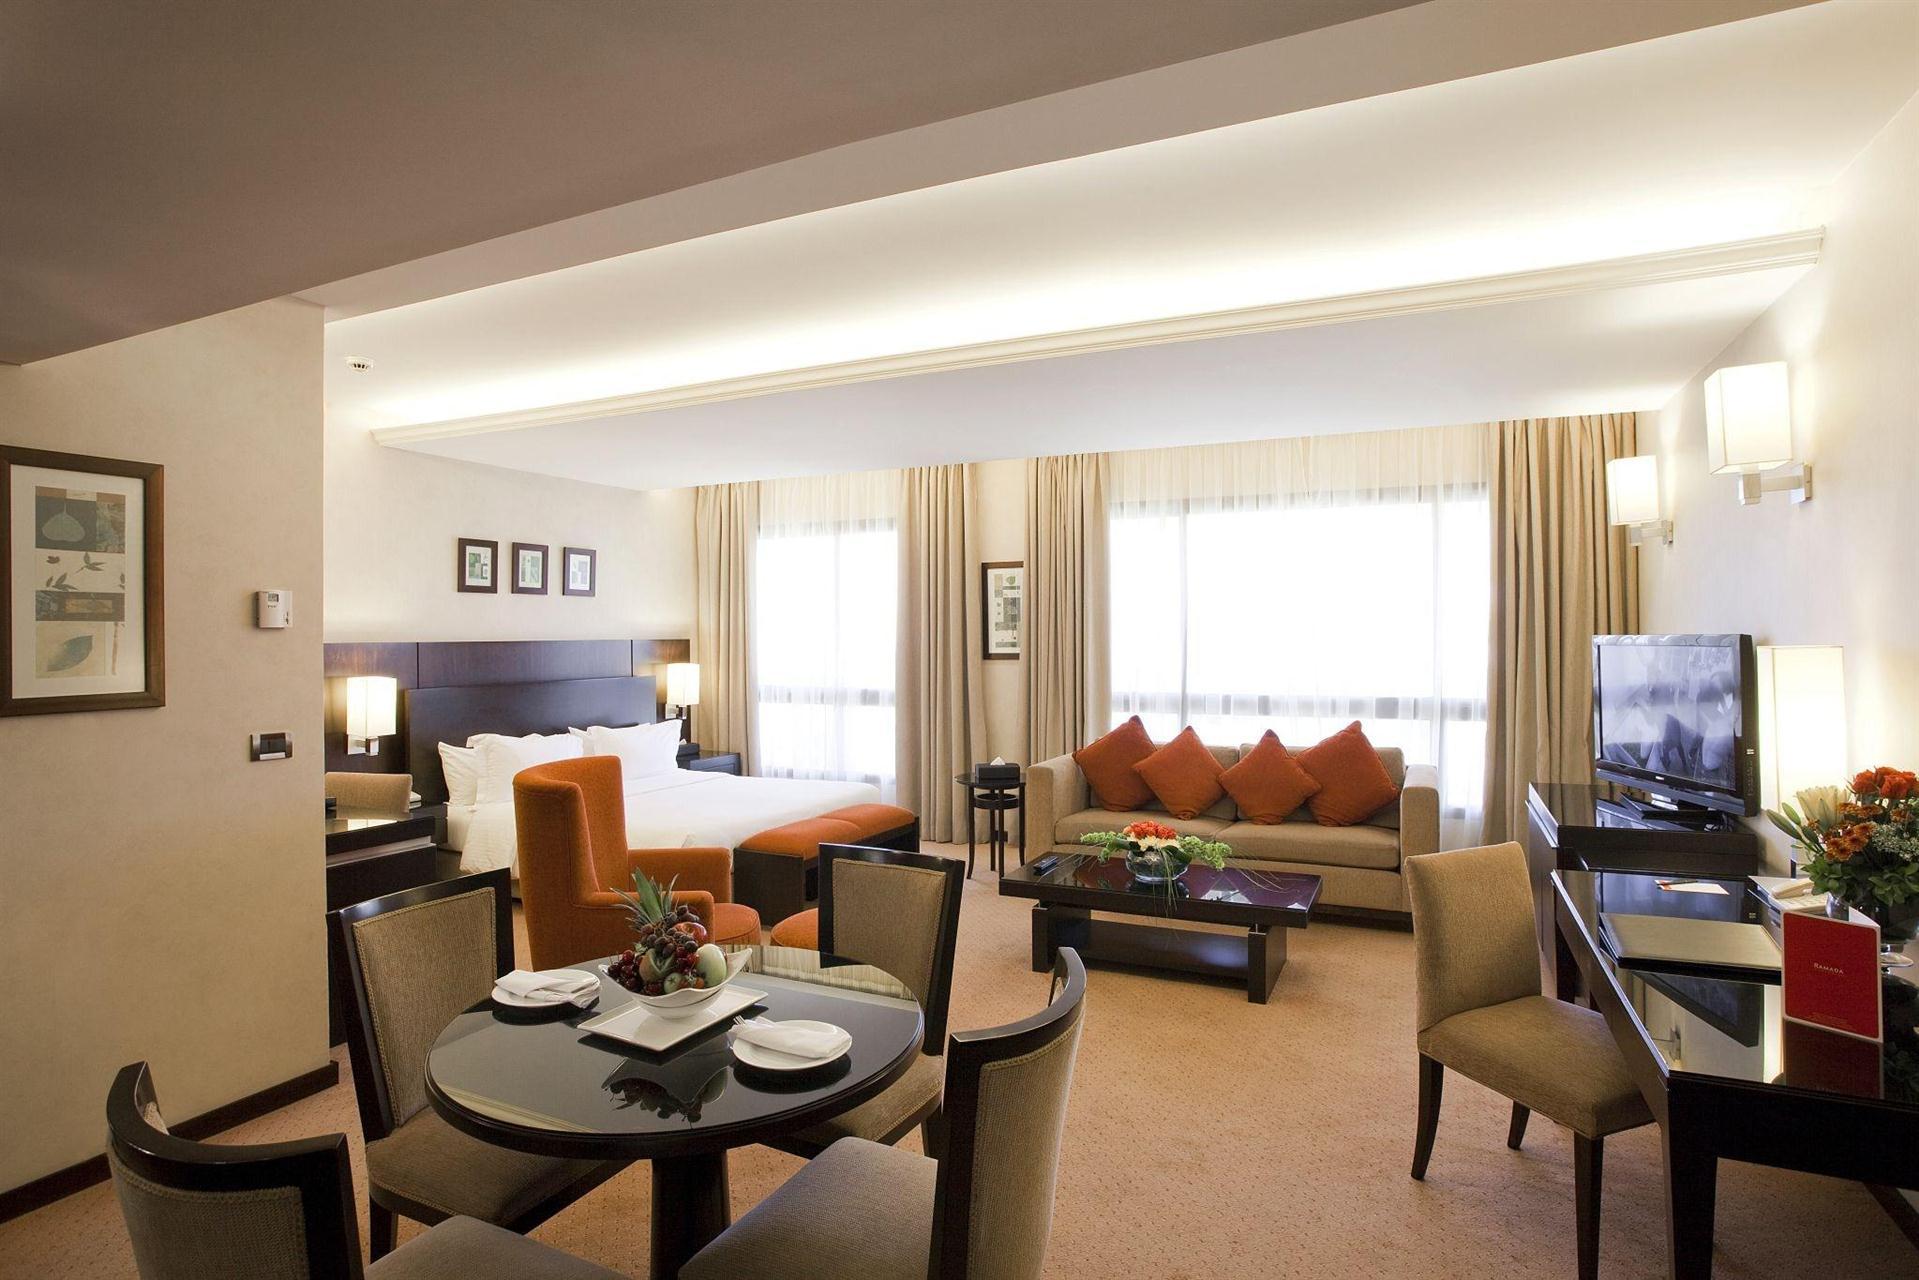 هتل رامادا پلازا بیروت رائوش